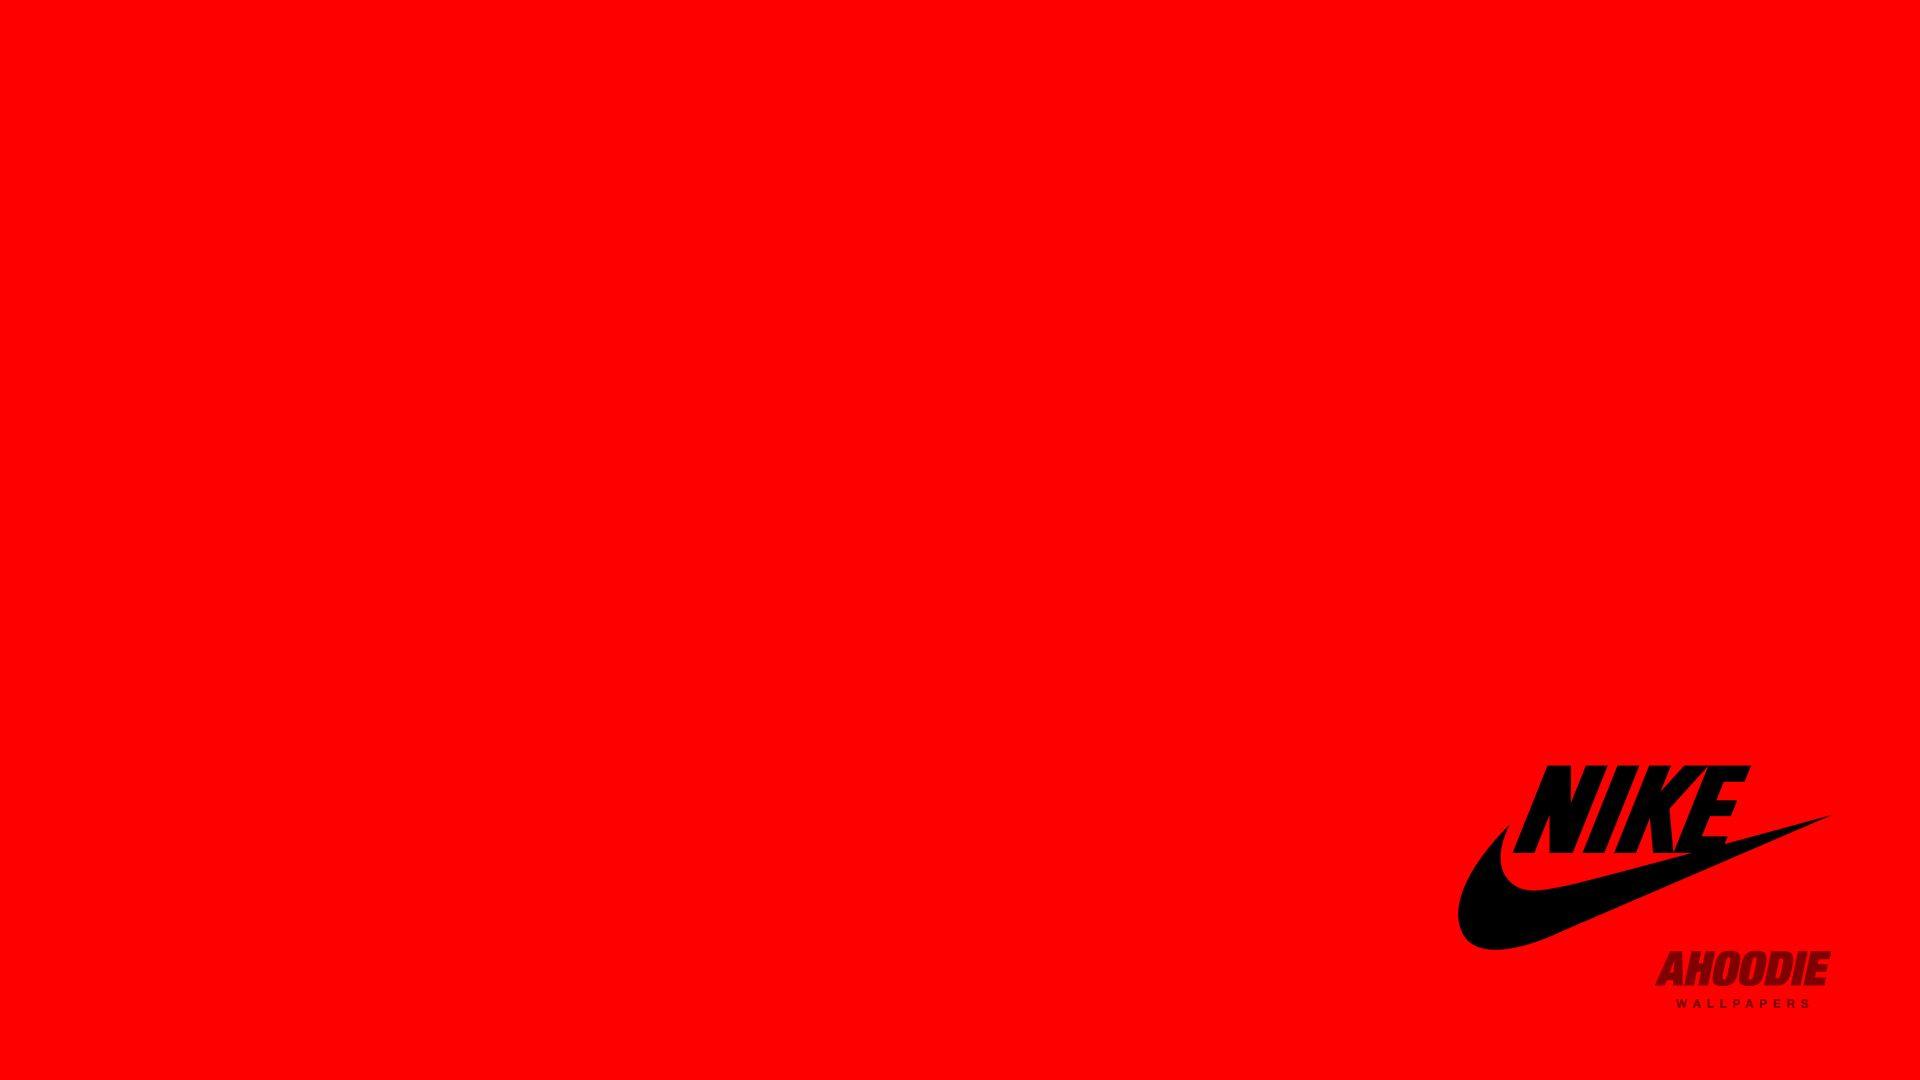 Red Nike Wallpaper 1920x1080